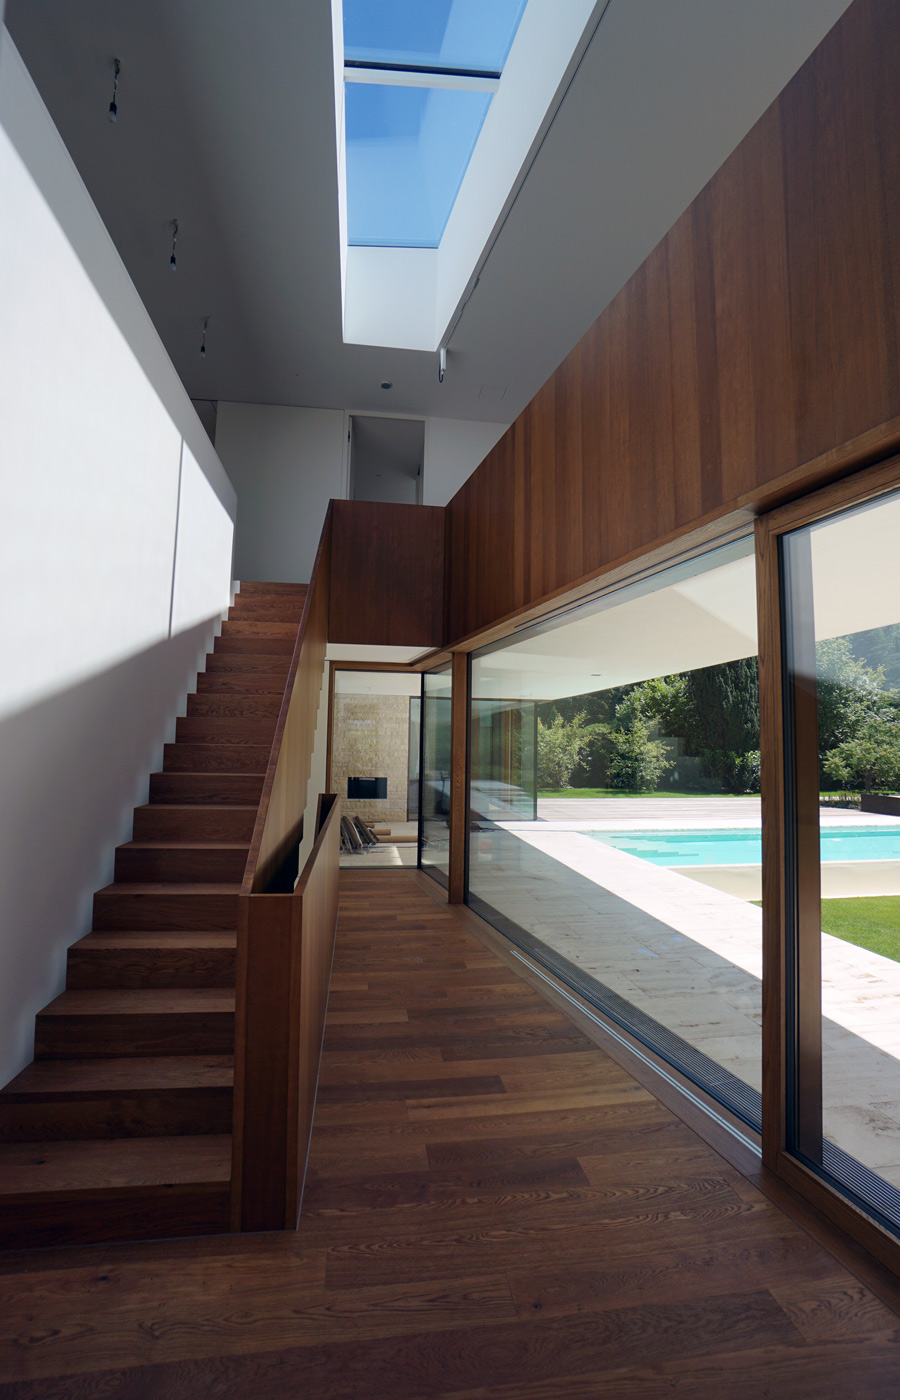 Treppe massives Holz, Brüstung und Wandverkleidung Echtholz Furnier